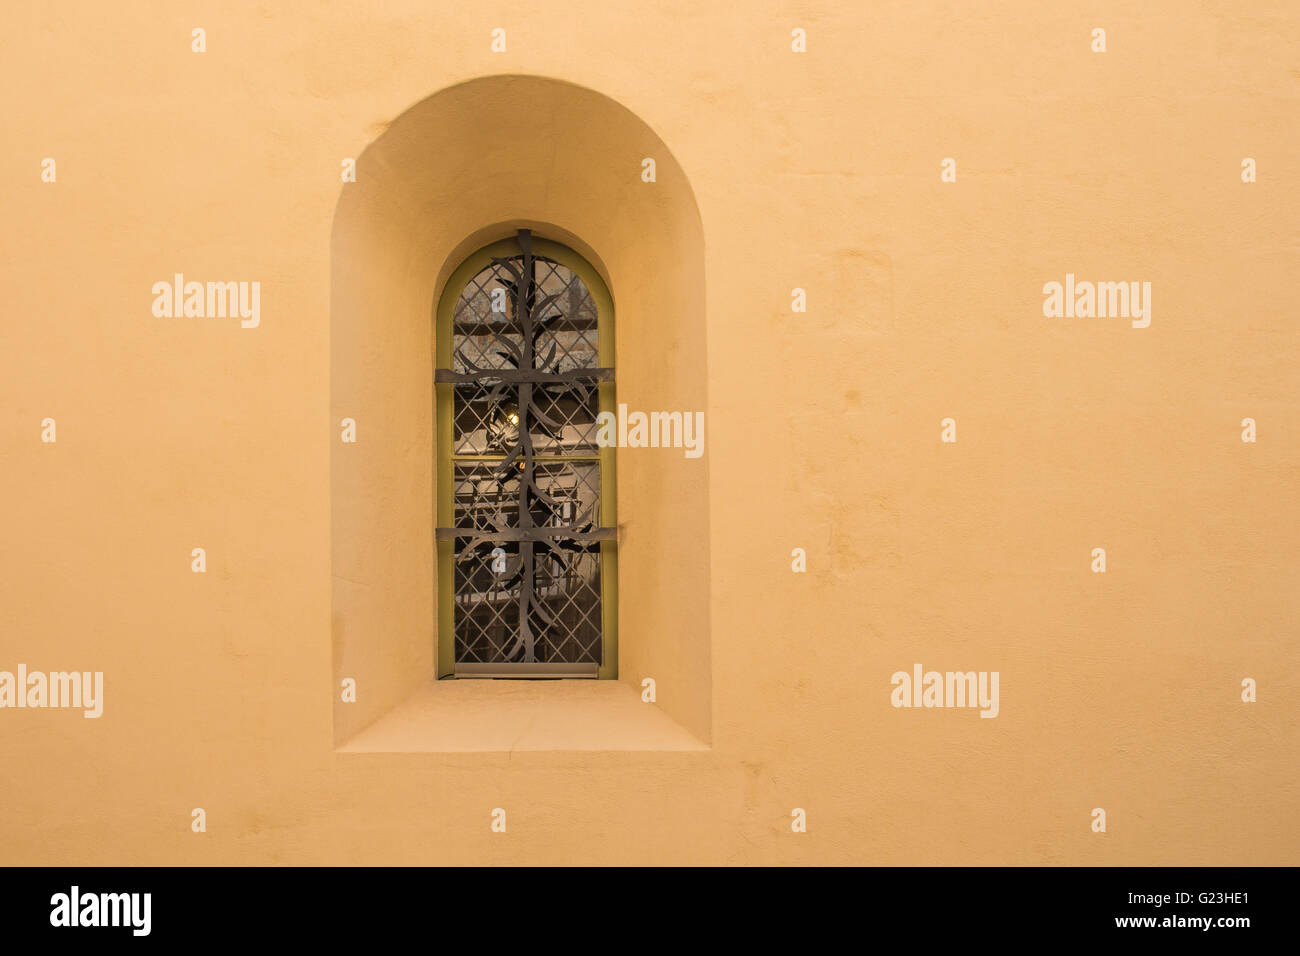 Malta Mdina Wall Stock Photos & Malta Mdina Wall Stock Images - Alamy